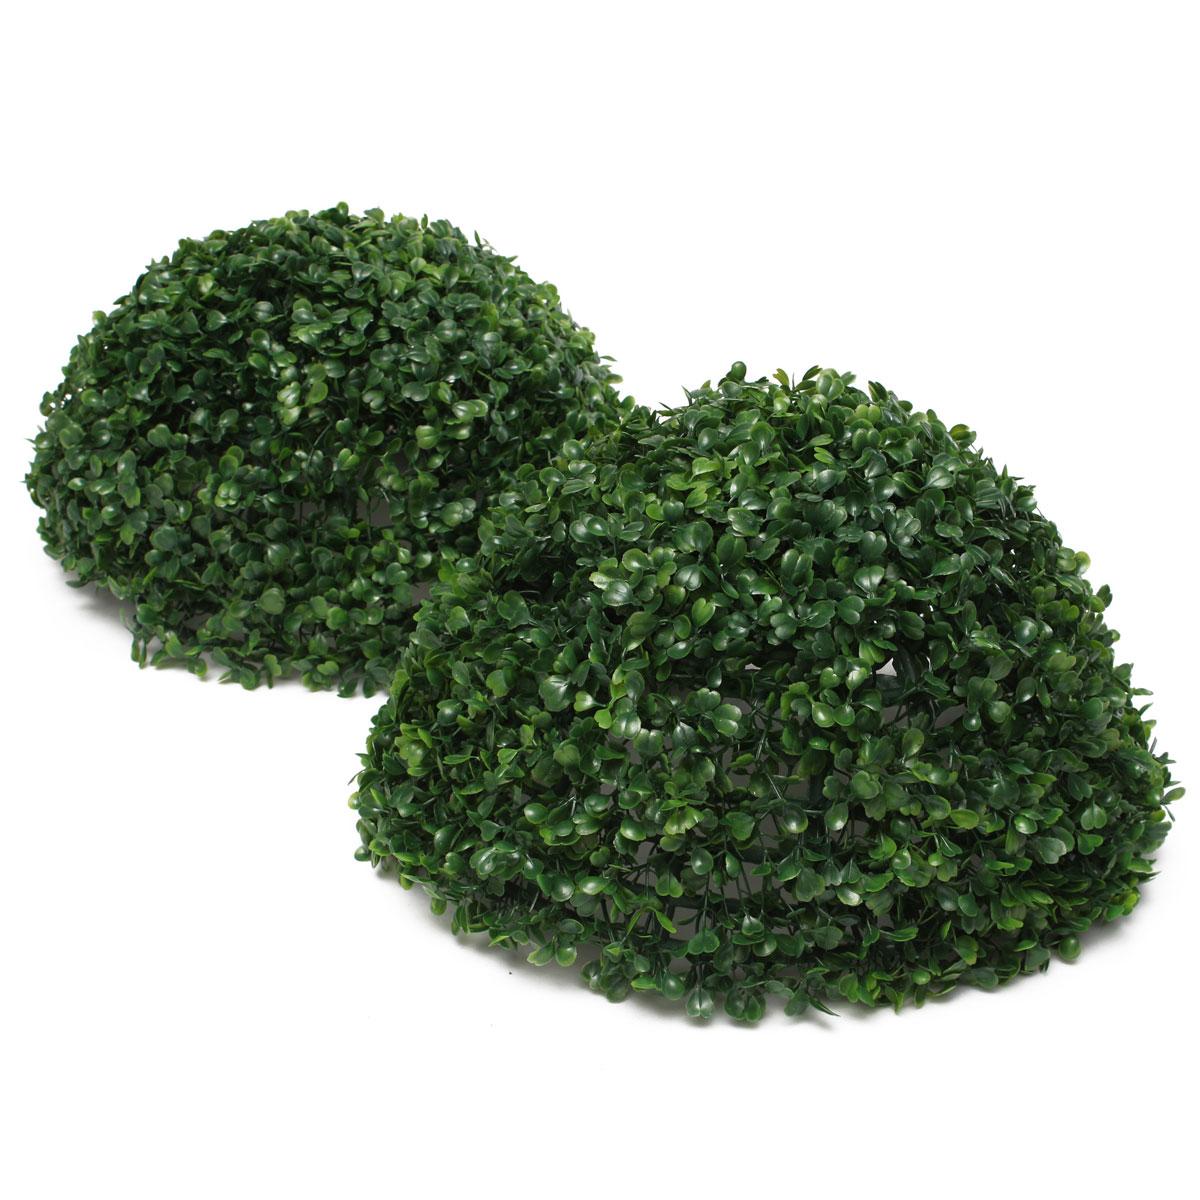 Topiary 35cm Plastic Conifer Topiary Ball Hanging Garden Patio Decor Garden Supplies